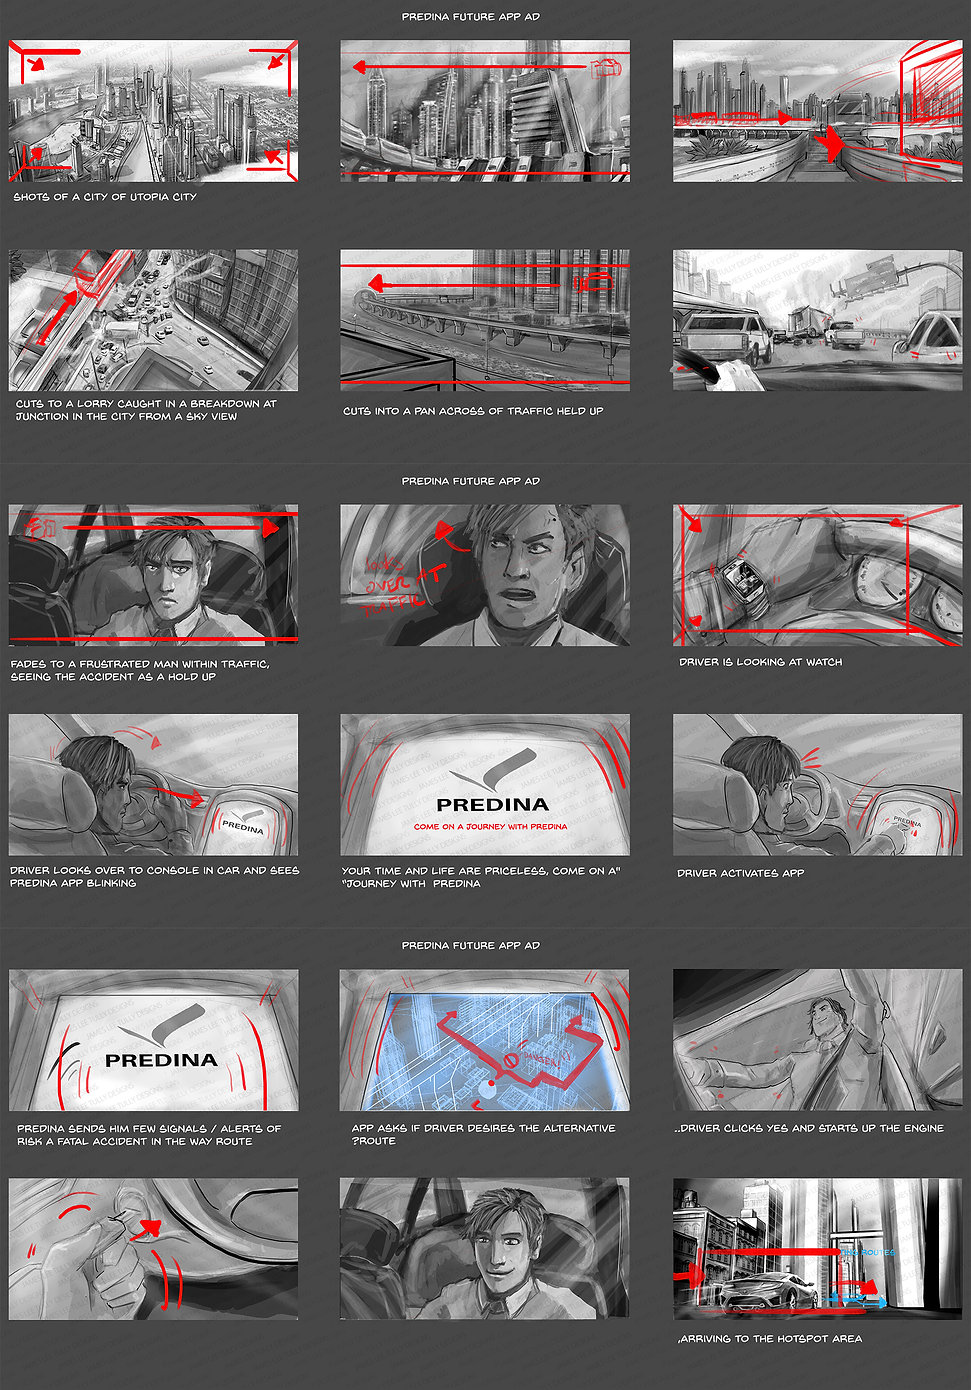 predina navigation app storyboard